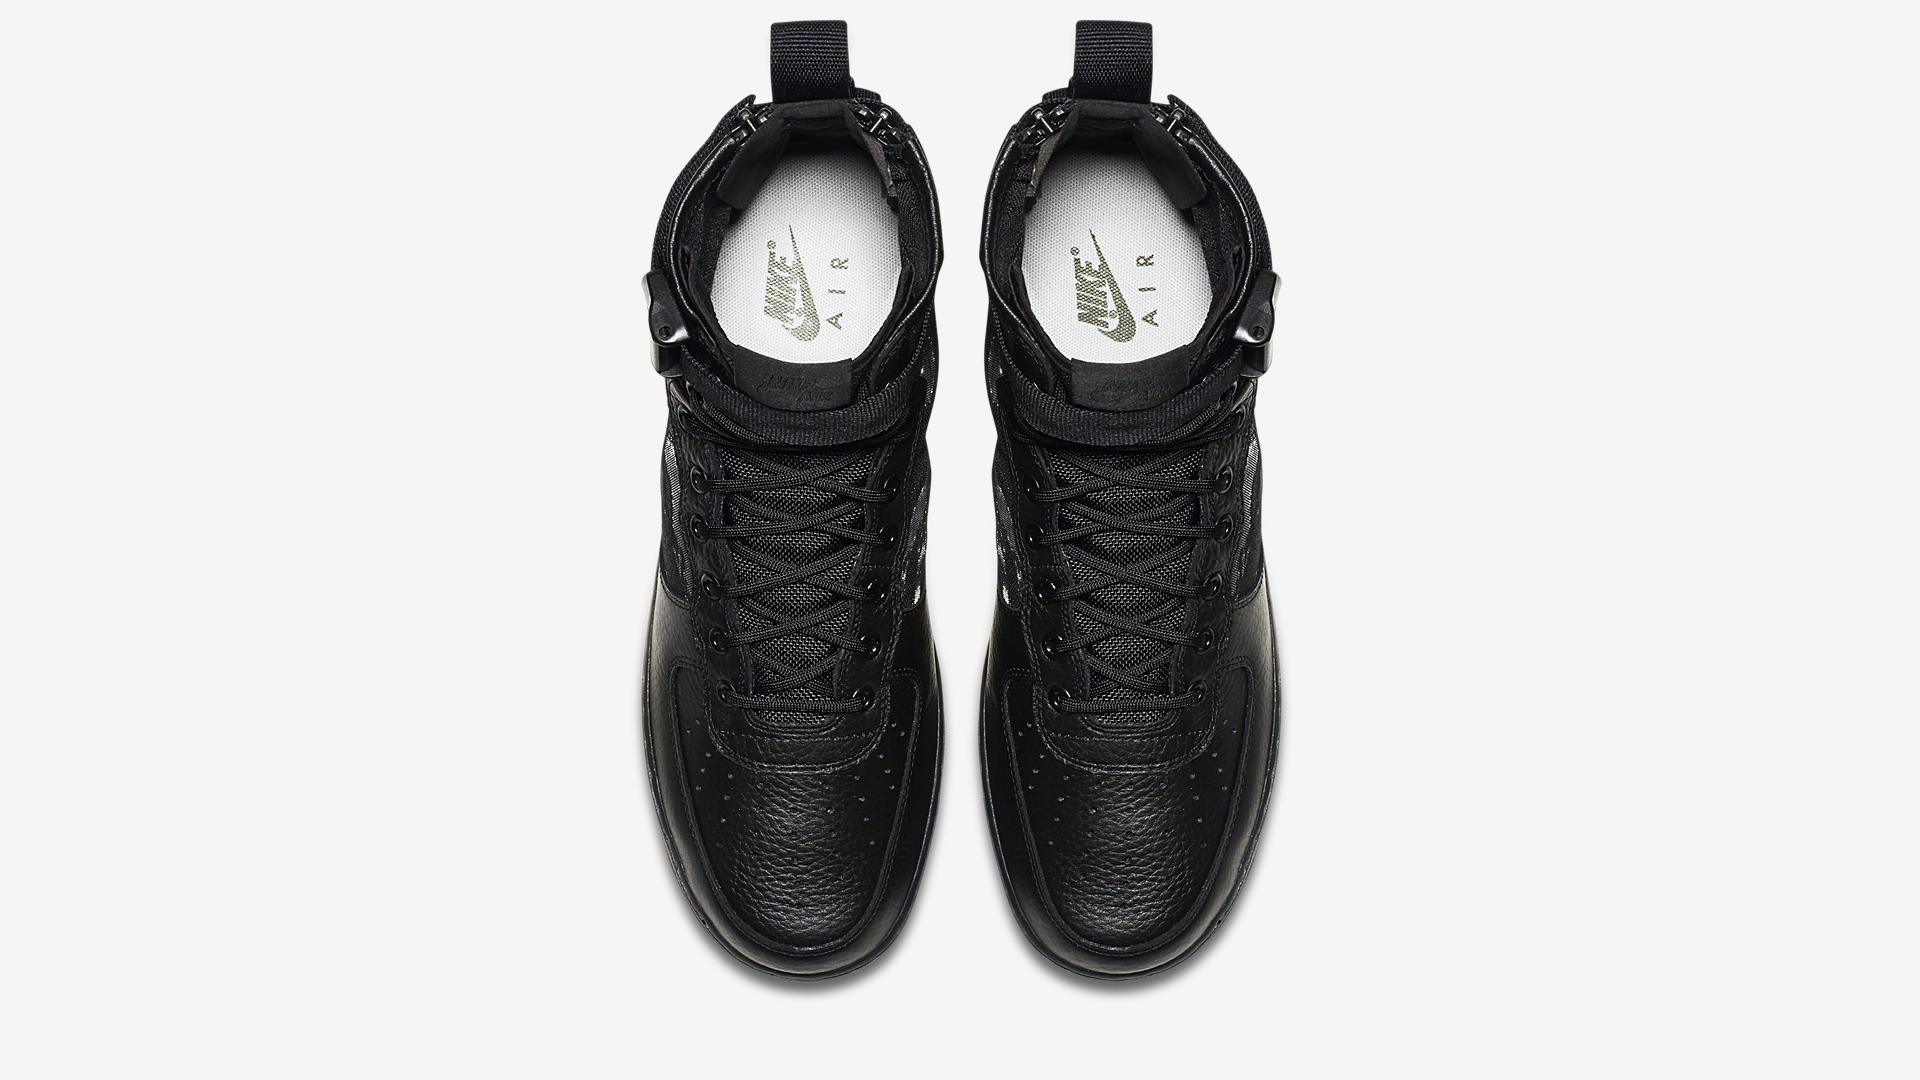 Nike SF Air Force 1 Mid Black Cargo Khaki AA7345 001 1